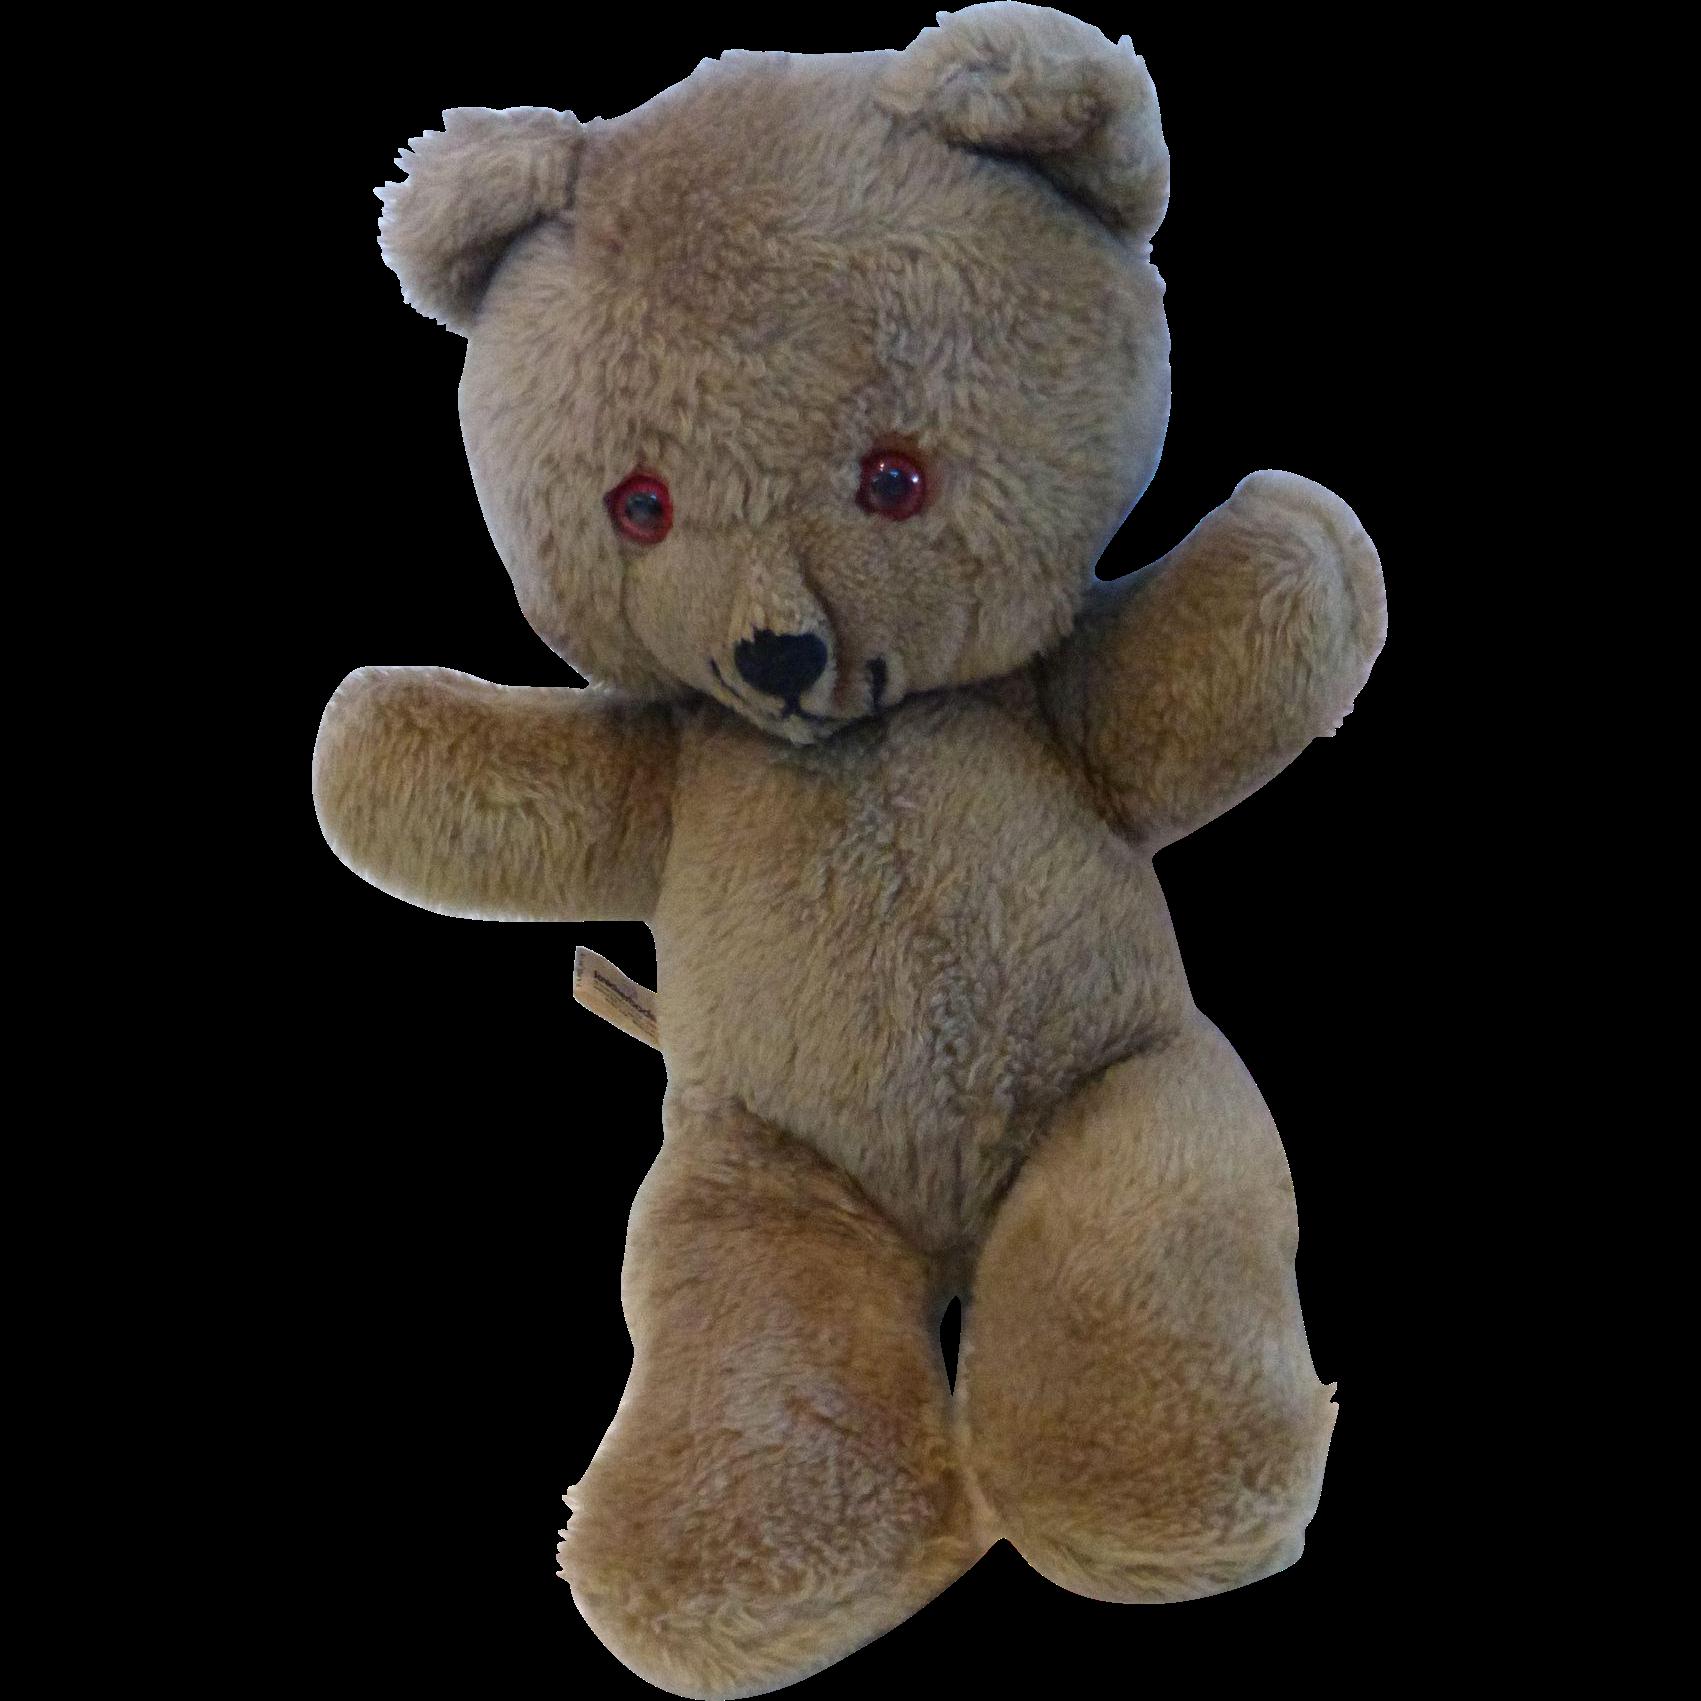 Vintage Knickerbocker Animals of Distinction Teddy Bear ...